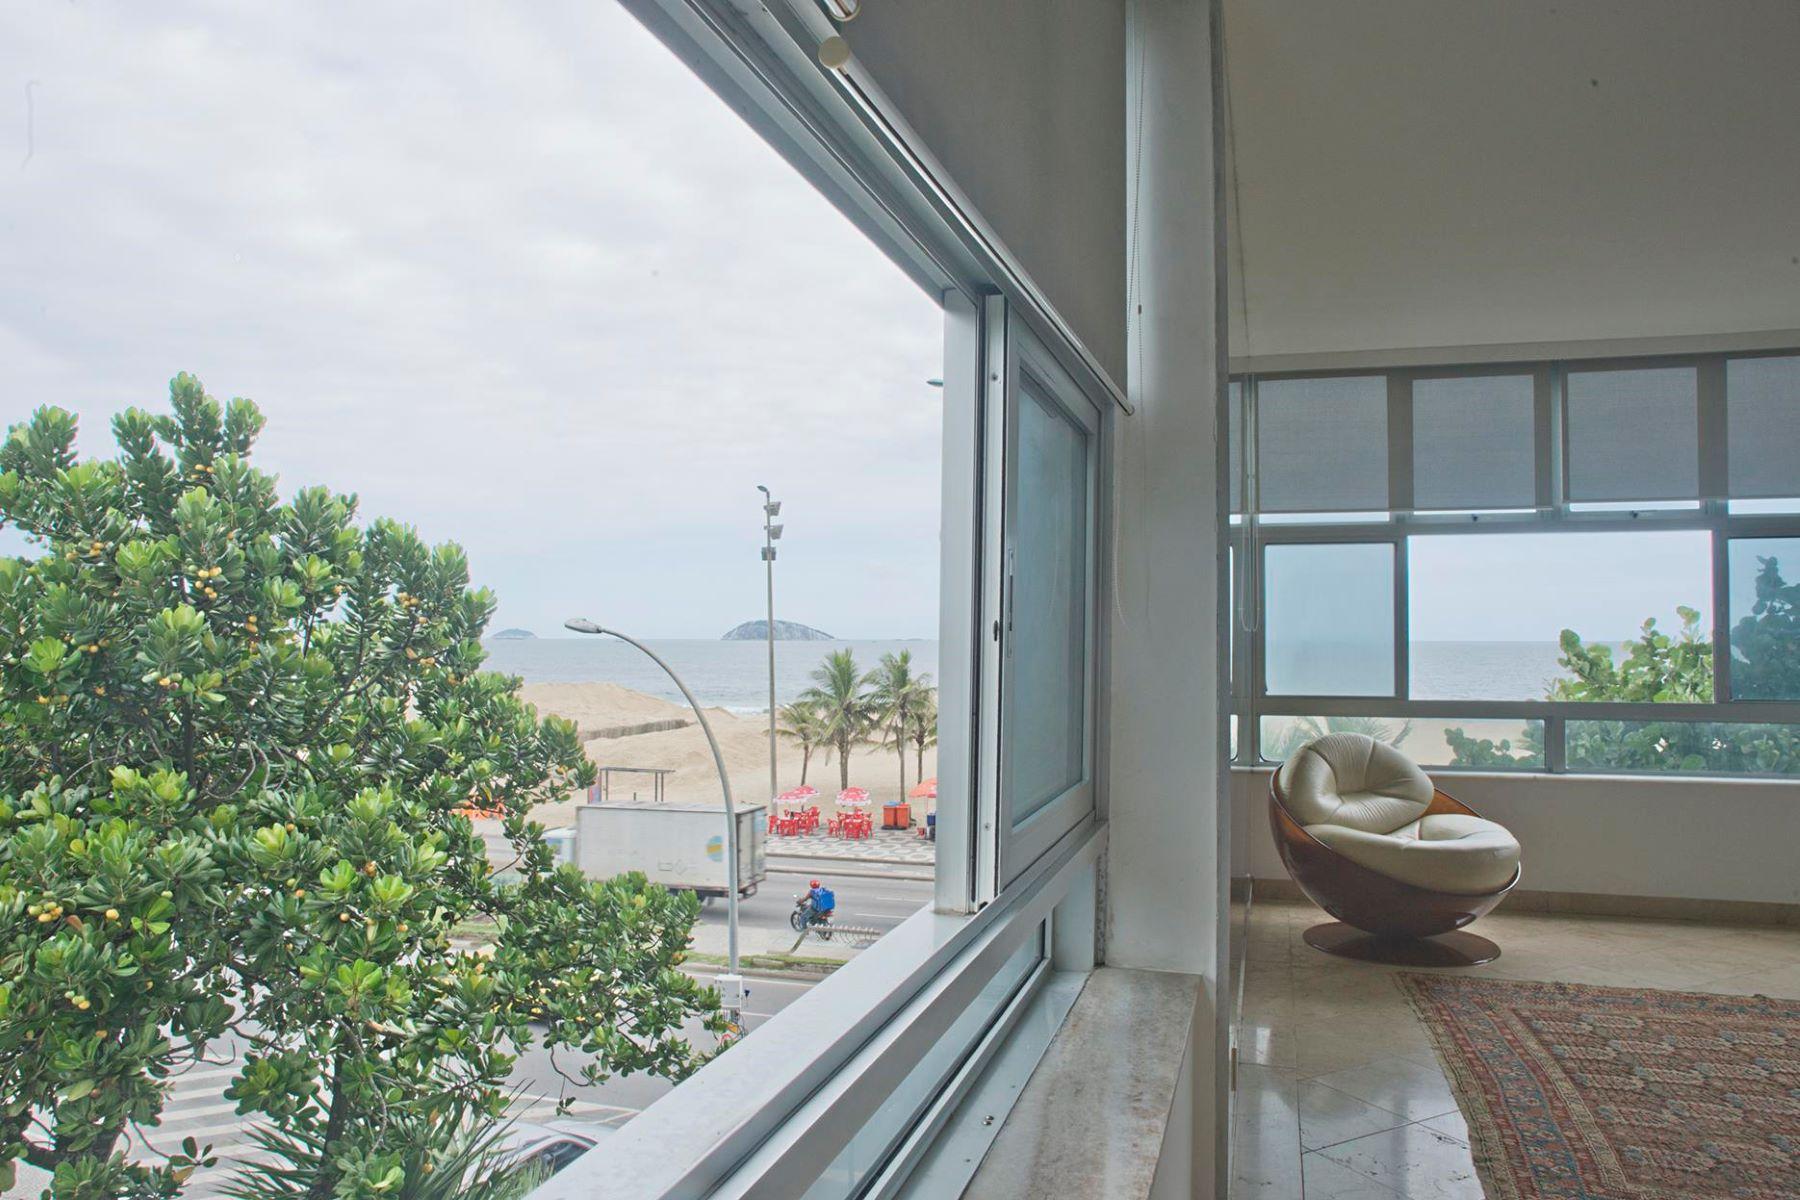 Einfamilienhaus für Verkauf beim Classy Seafront Apartment Rio De Janeiro, Rio De Janeiro, 22441-000 Brasilien